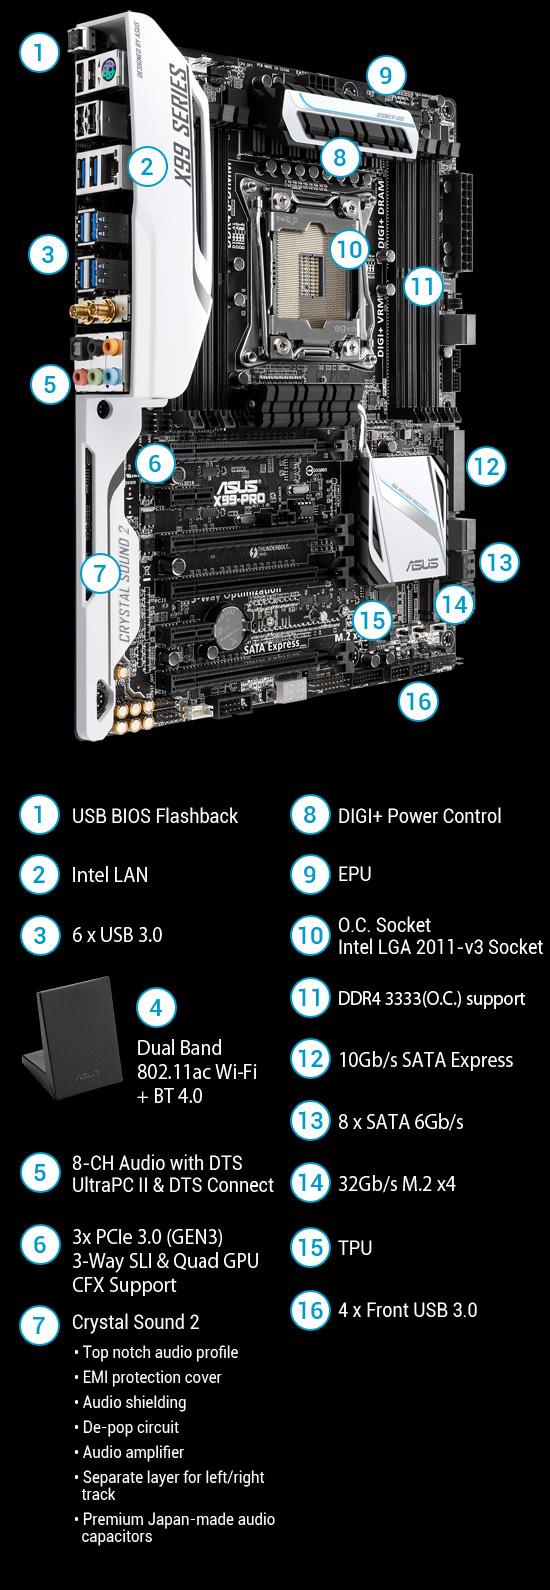 BIOS Chip ASUS X99-PRO//USB 3.1